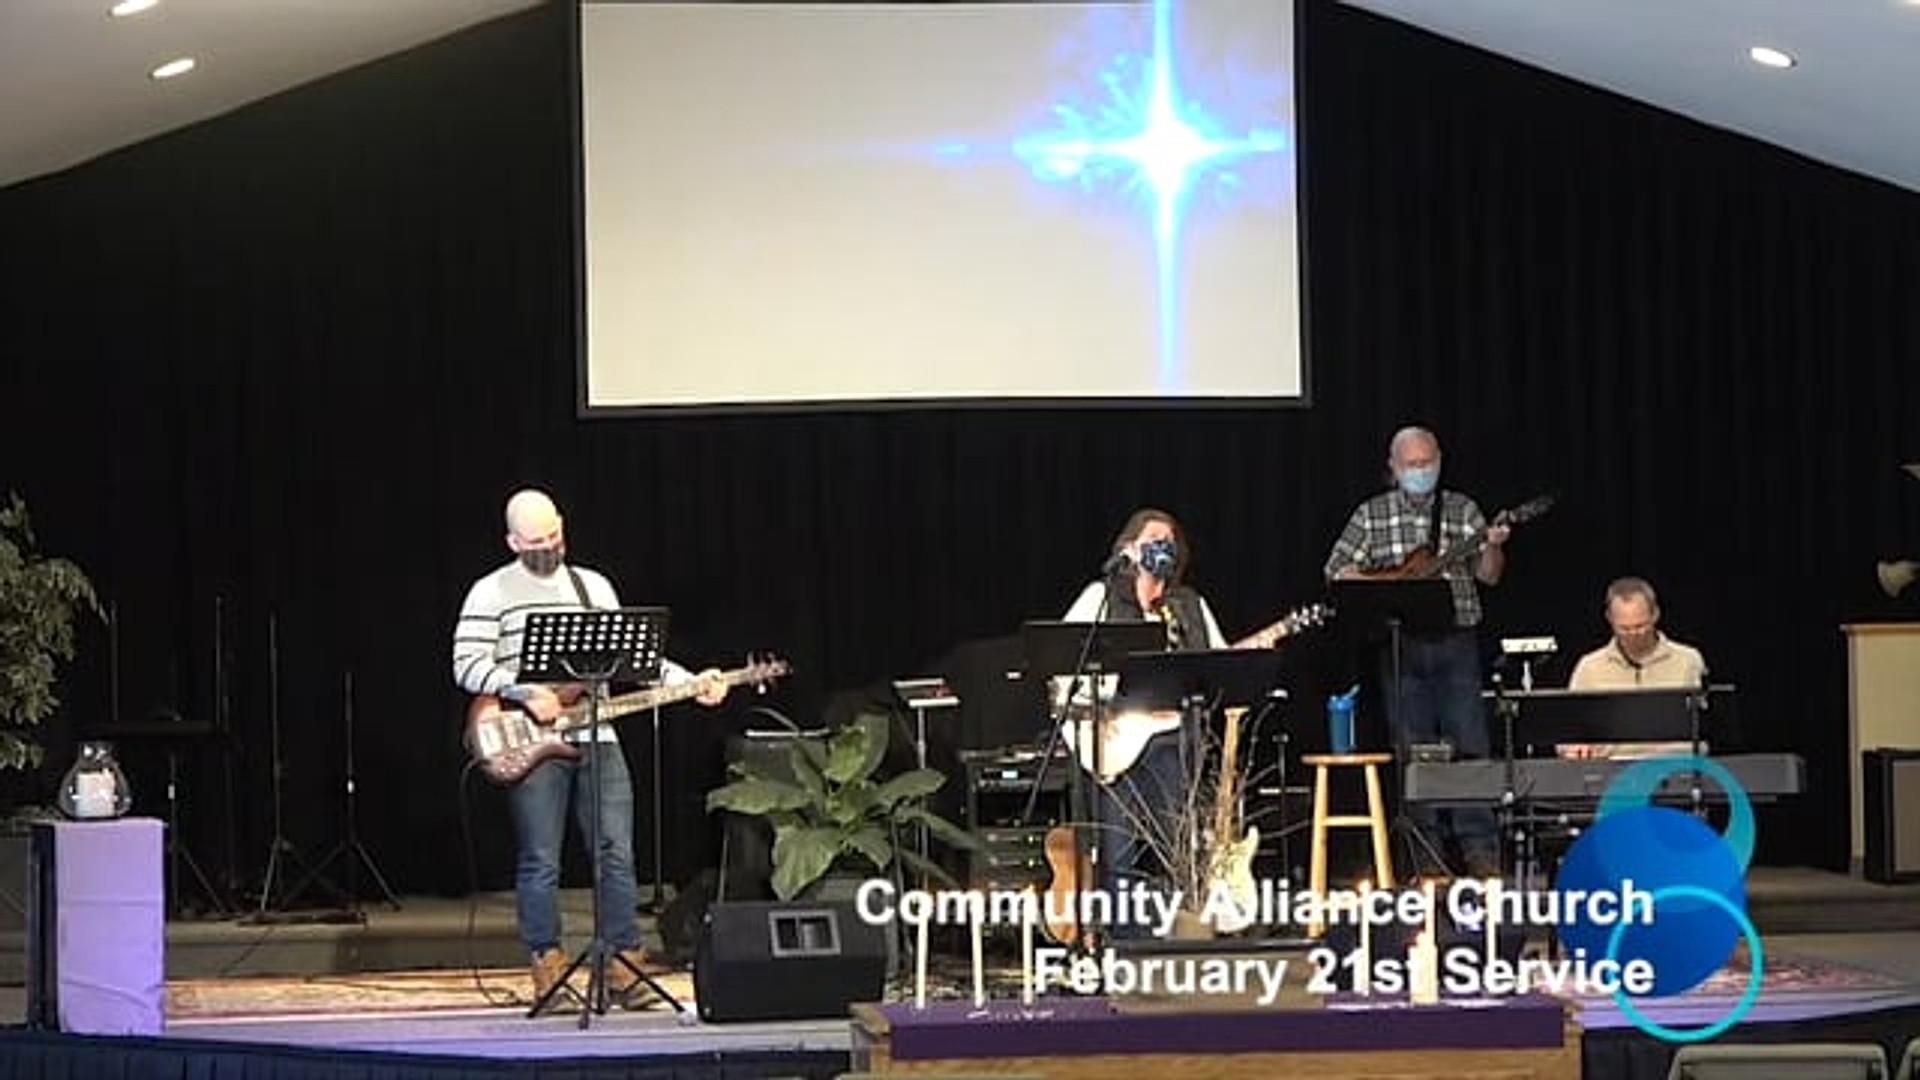 February 21st Service